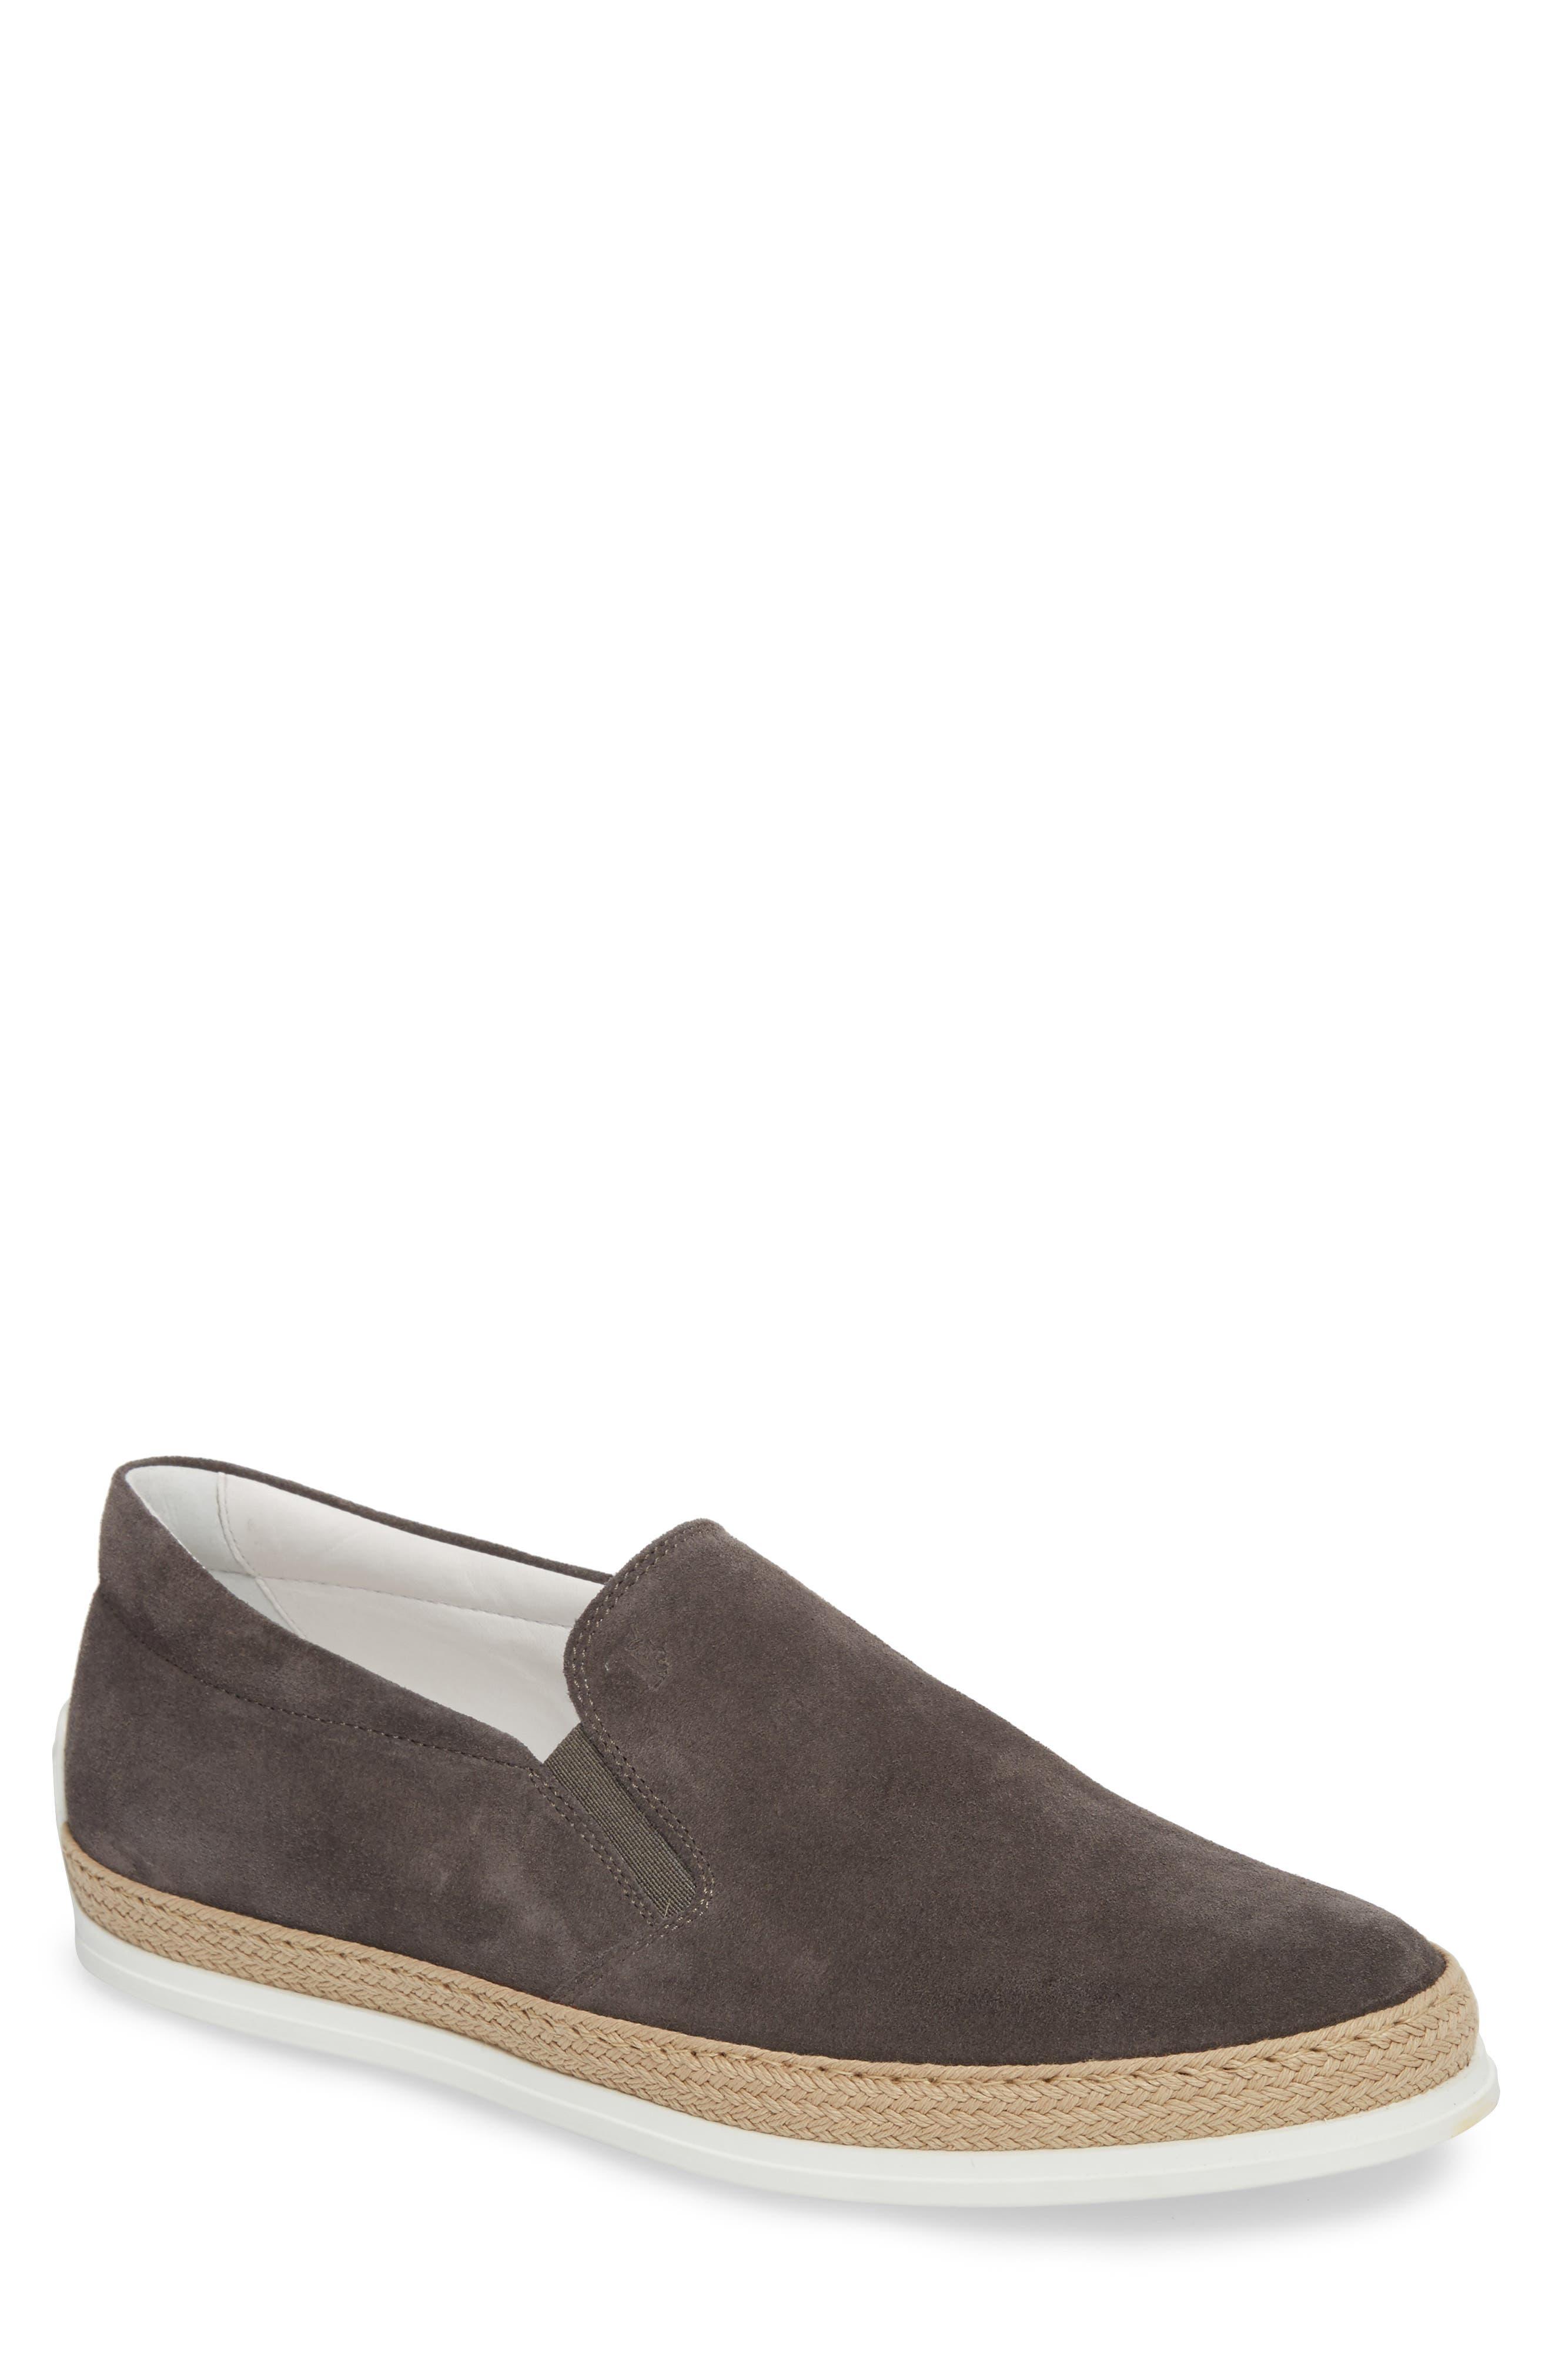 Espadrille Slip-On,                         Main,                         color, Grey